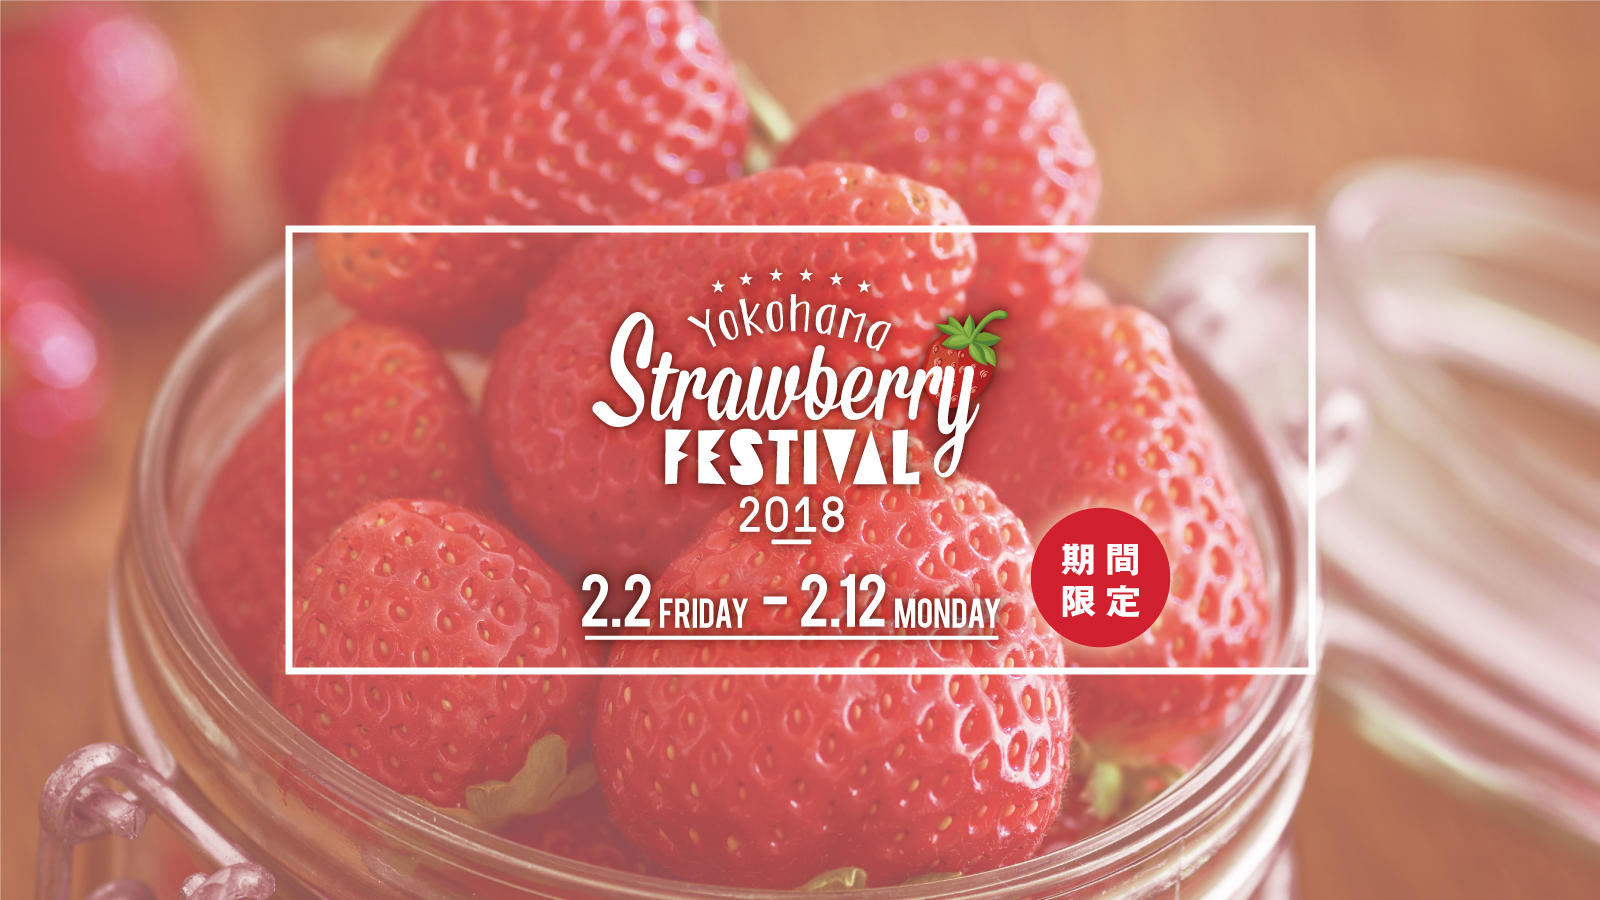 《Yokohama Strawberry Festival 2018》に参加決定!